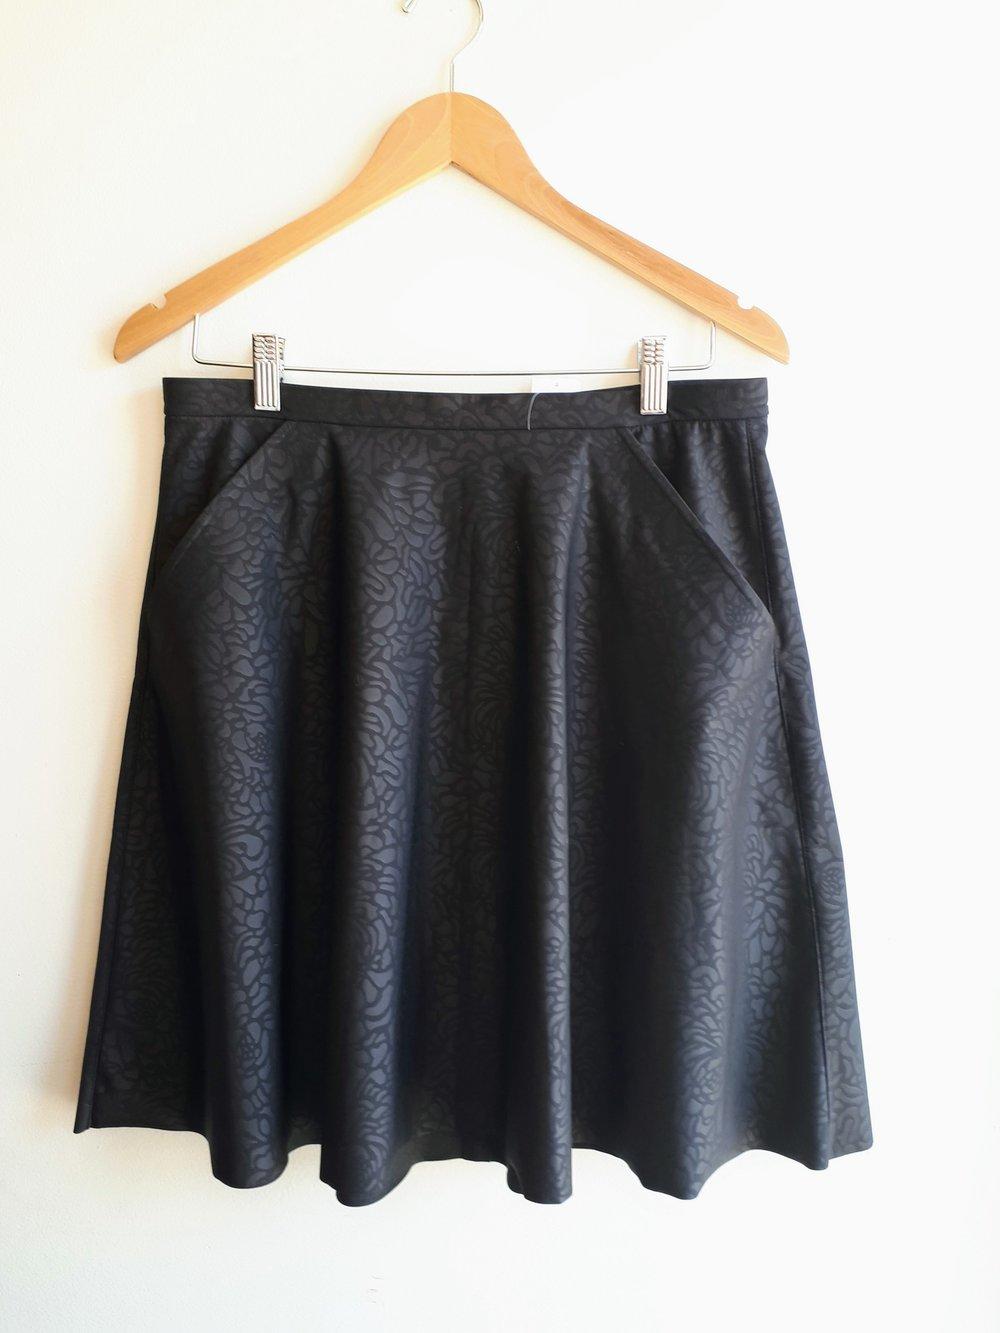 Lululemon skirt; Size M, $42